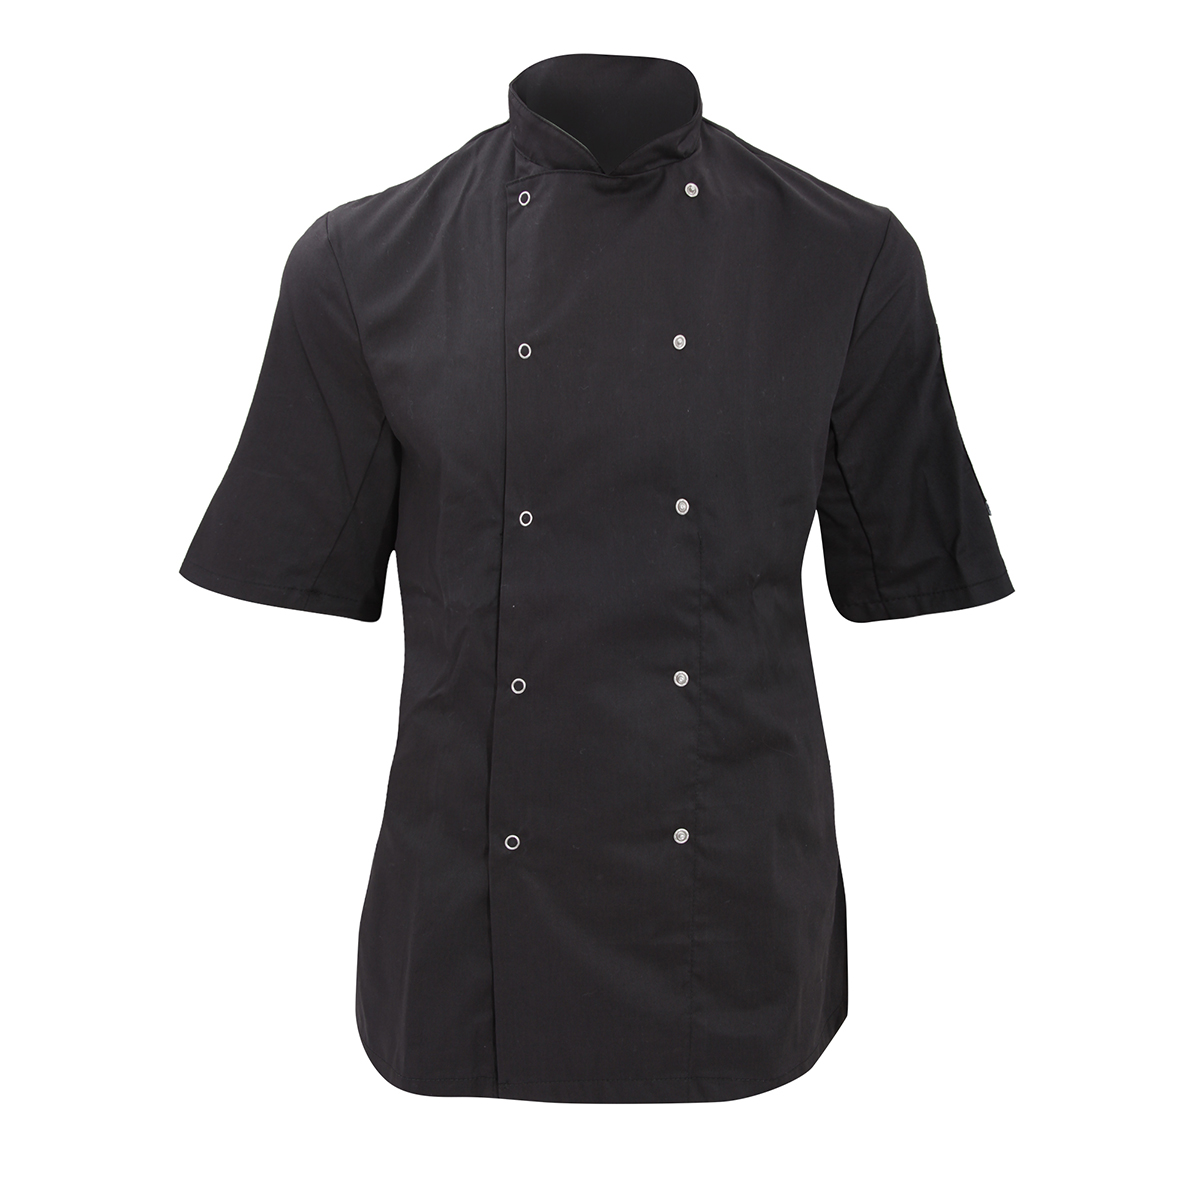 Dennys Womens/Ladies Economy Short Sleeve Chefs Jacket / Chefswear (Pack of 2) (L) (Black)